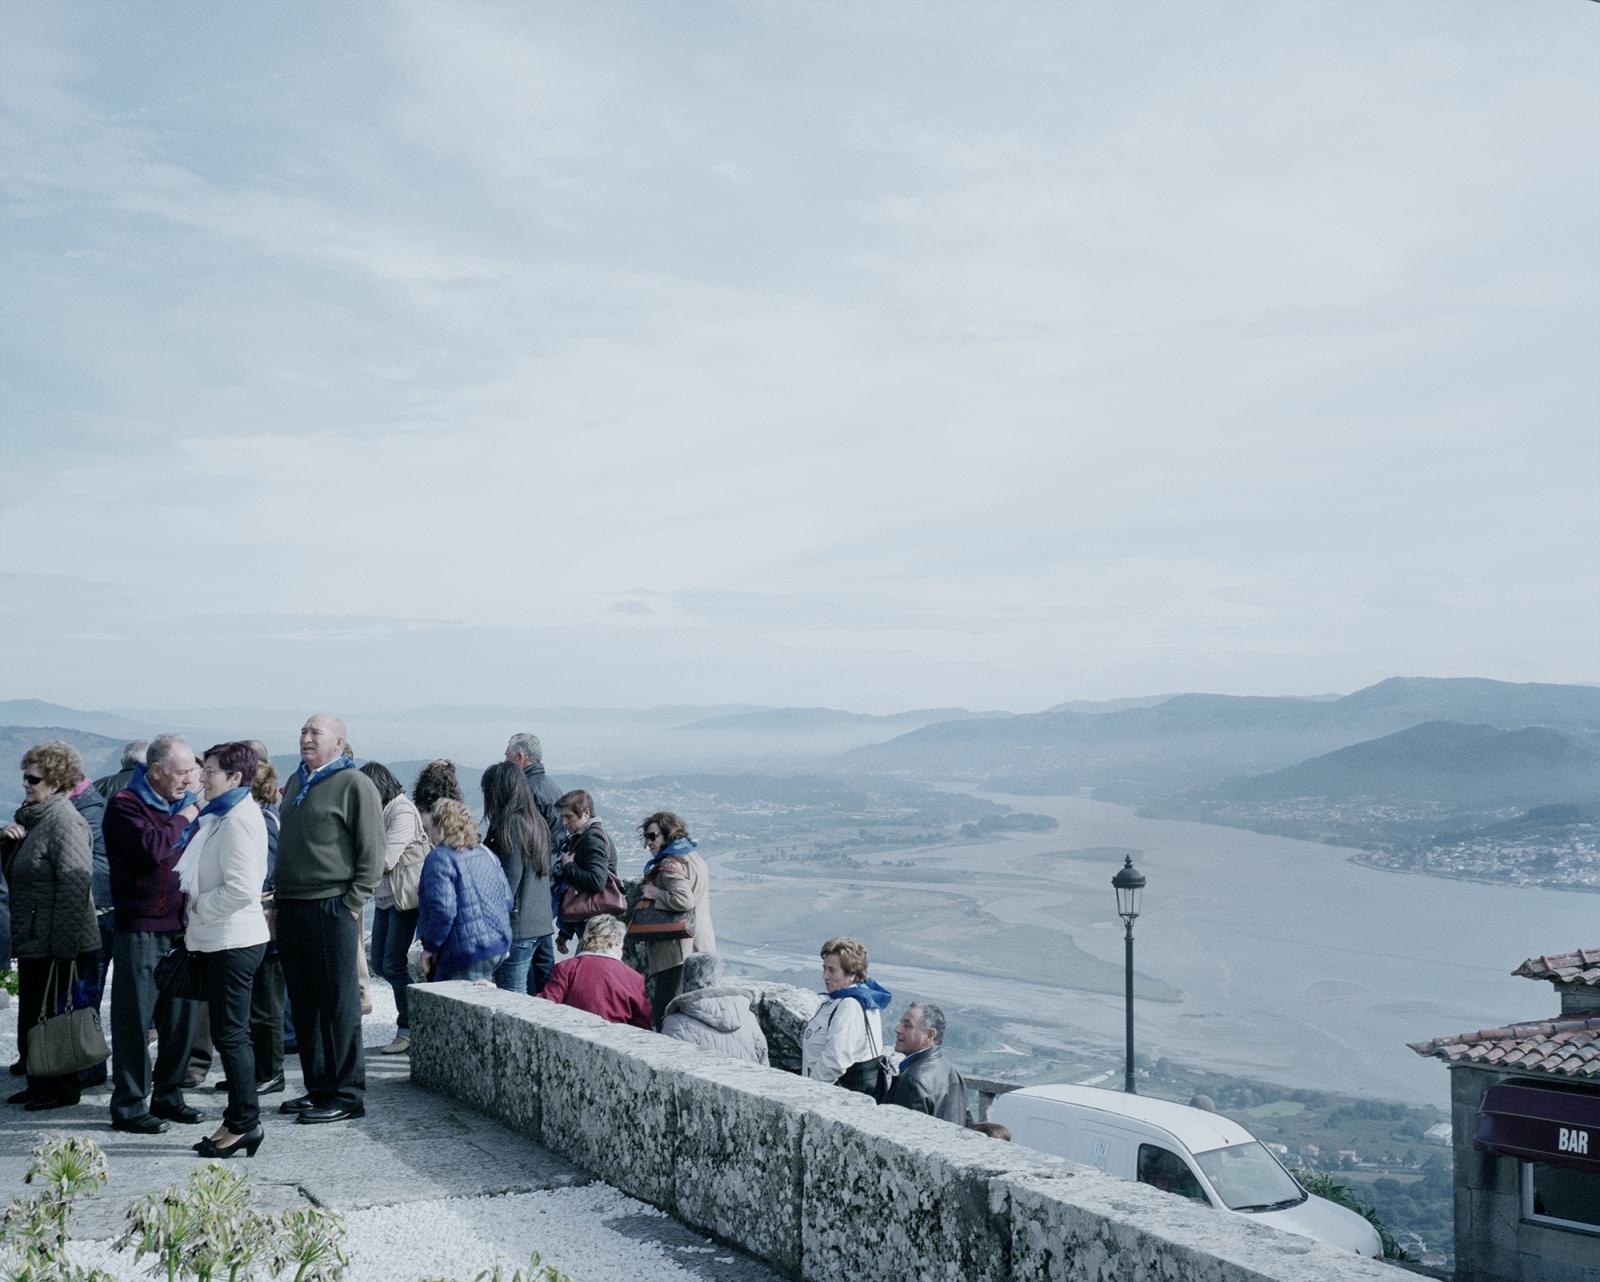 Spain, A Gurada. Tourists visit a catholic sanctuary on the Spanish side of the Minho river.